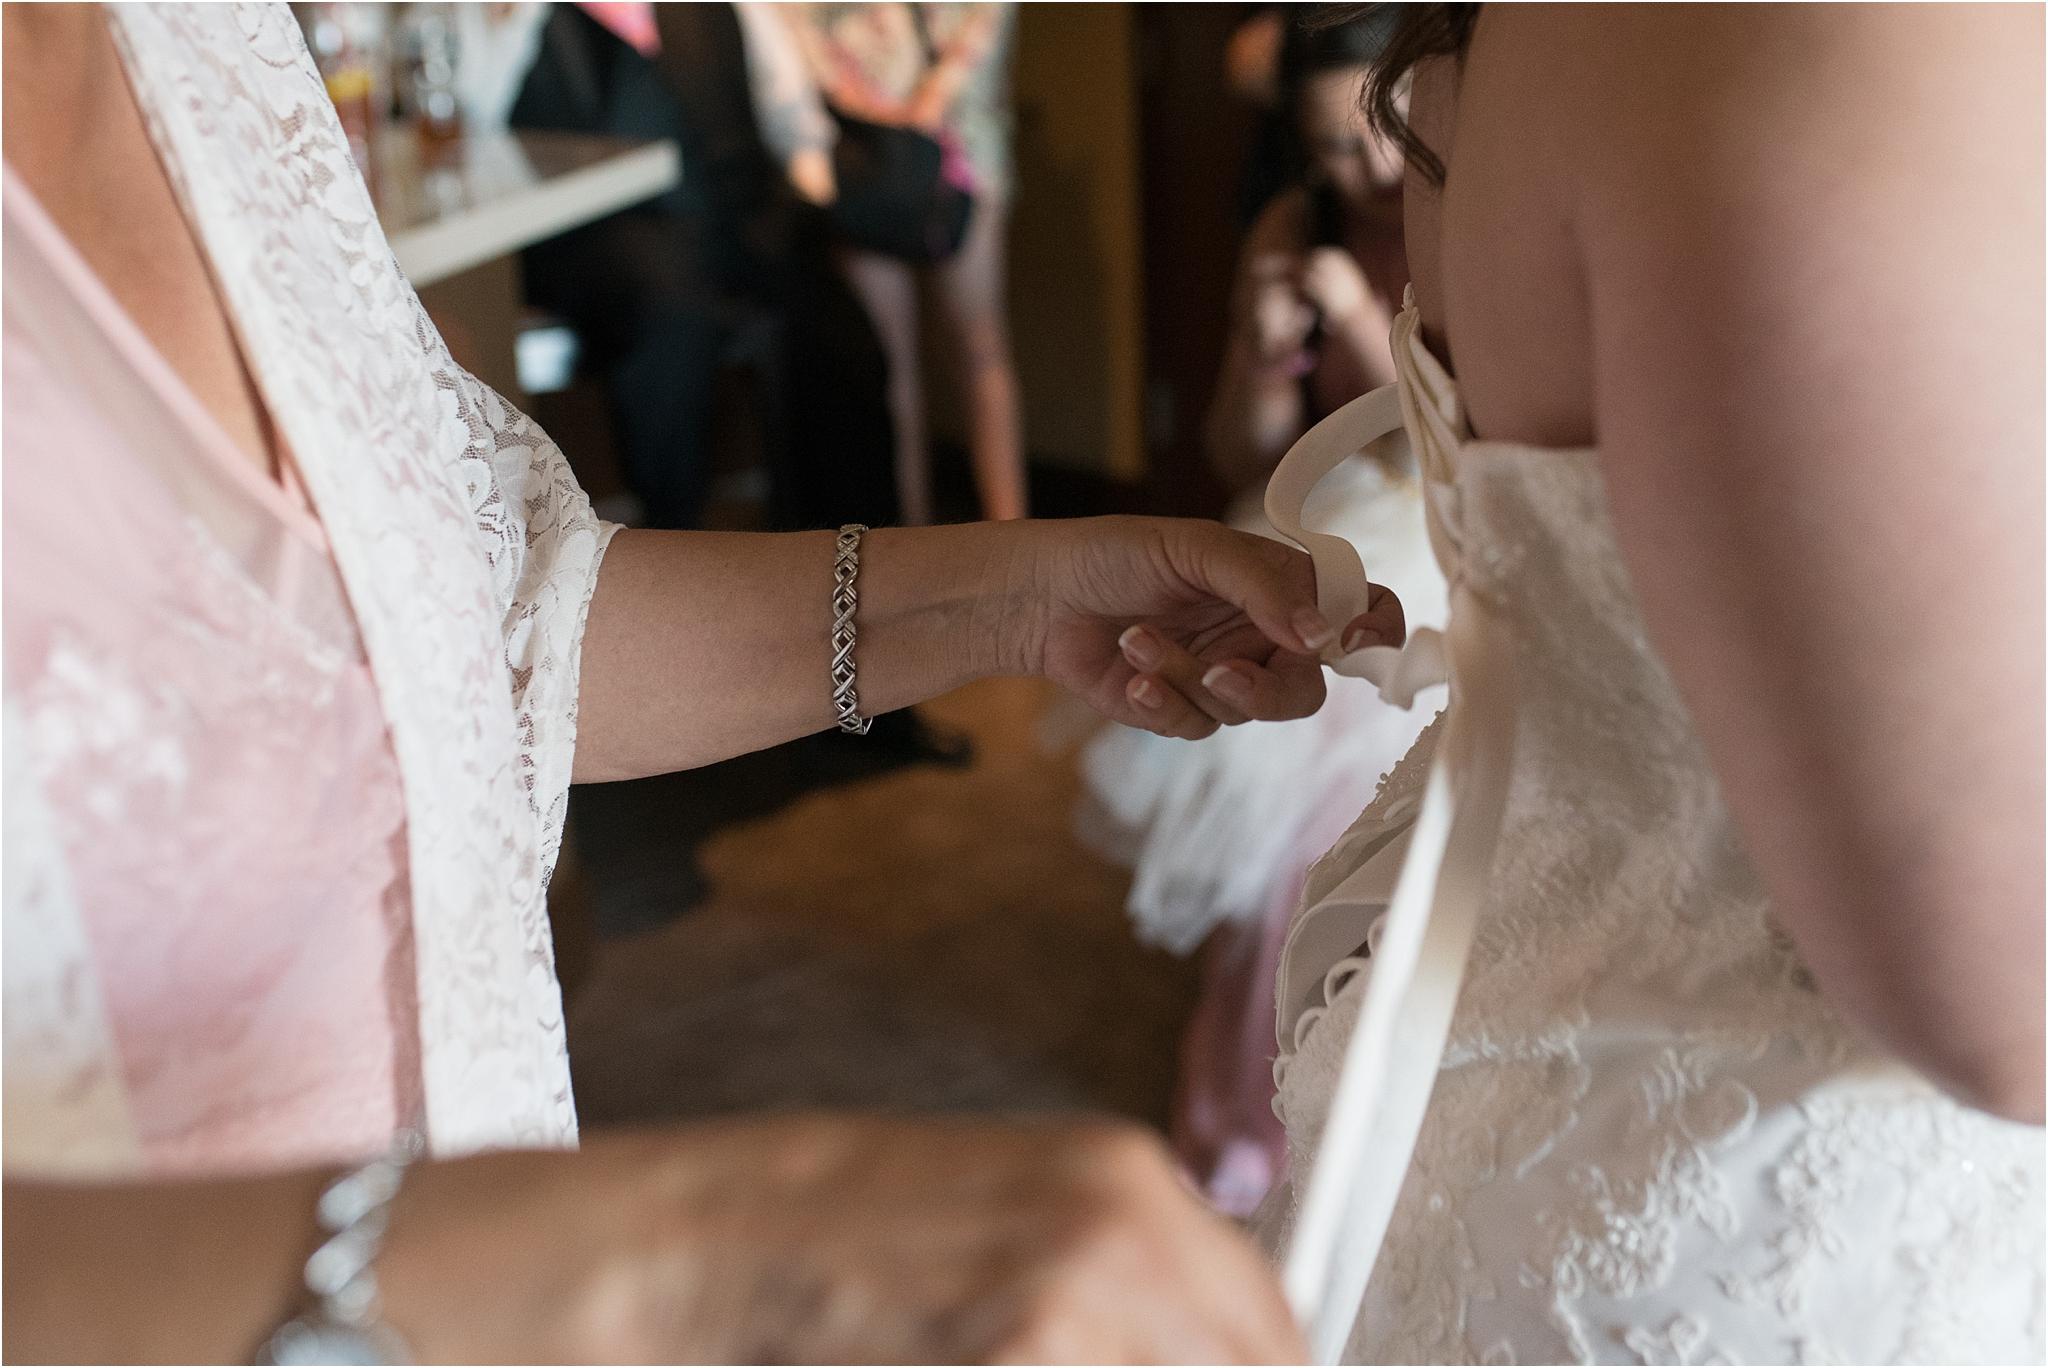 kayla kitts photography - isleta casino wedding - albuquerque wedding photographer - new mexico wedding photographer - de novo pastoral_0008.jpg